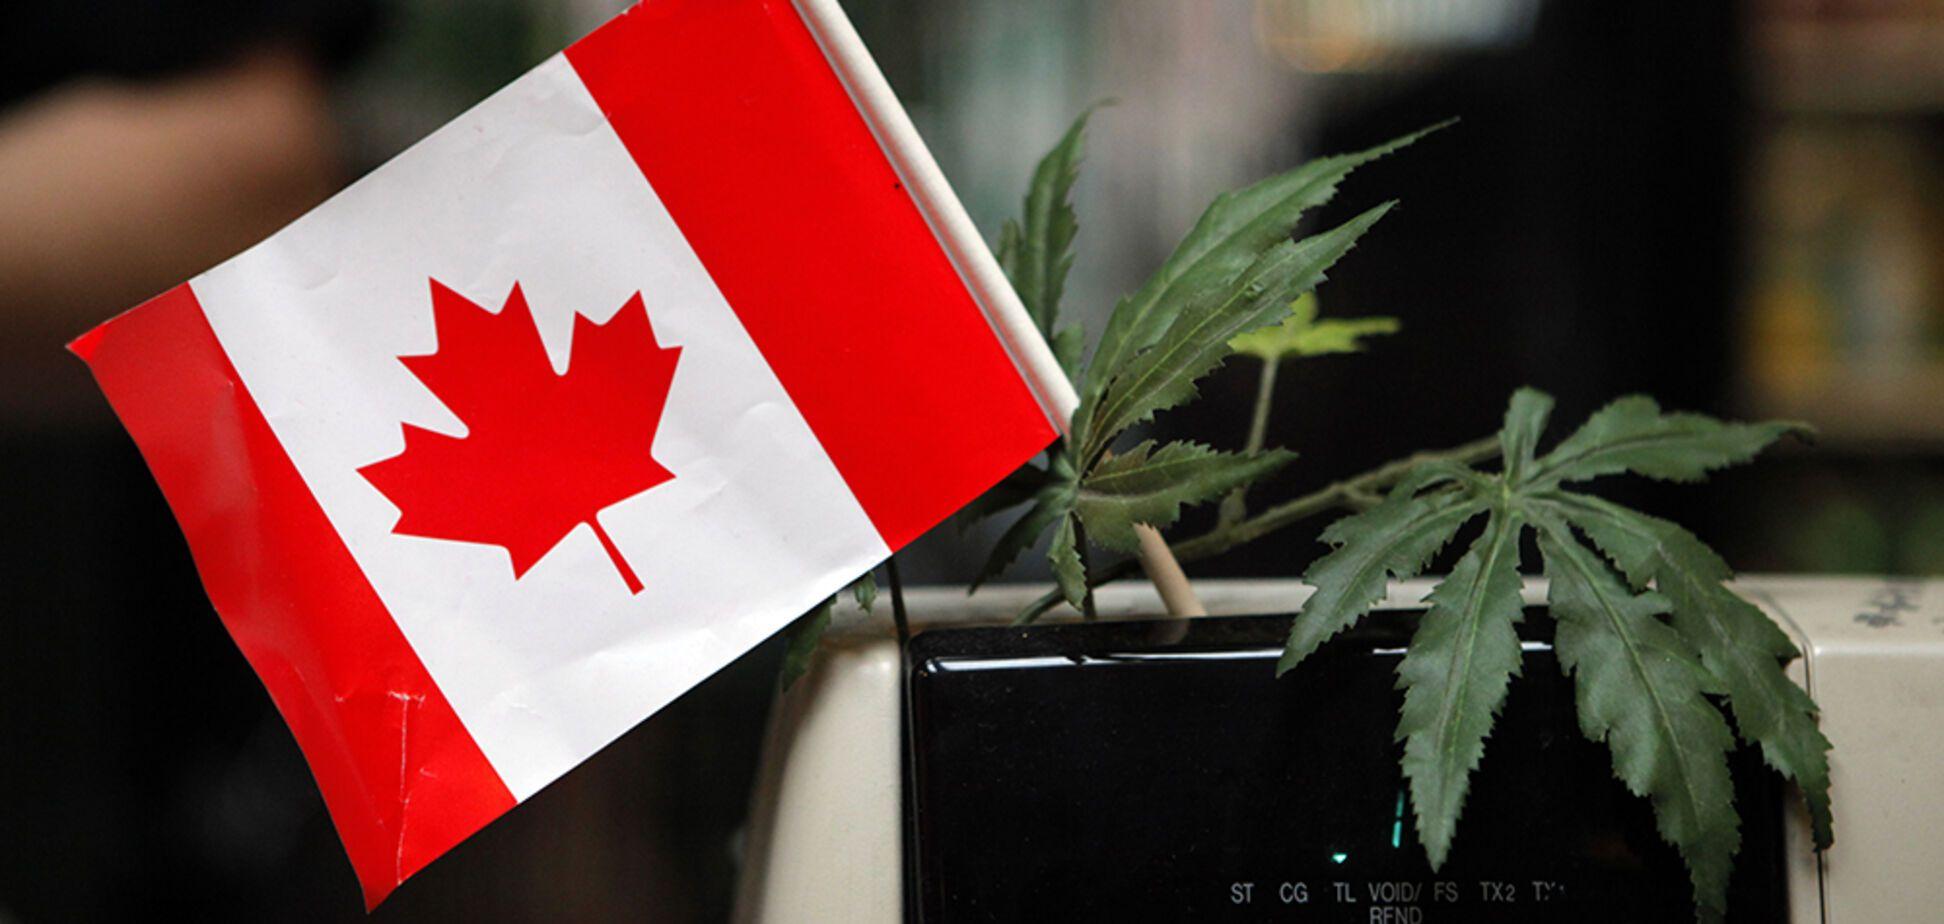 В Канаде разрешили проносить наркотики в самолет